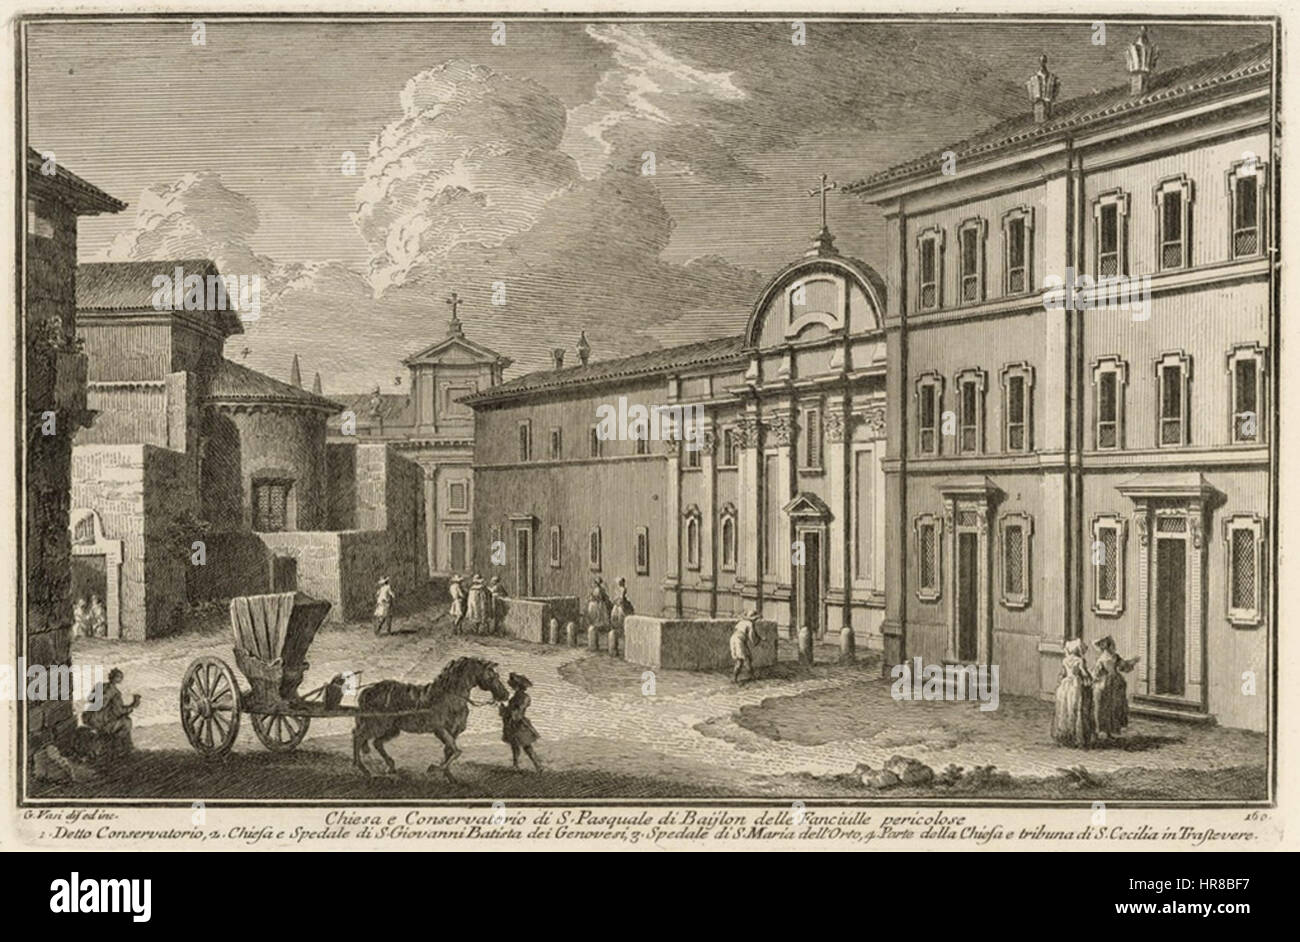 Vasi Conservatorio di San Pasquale Baylon Stock Photo: 134794331 ...